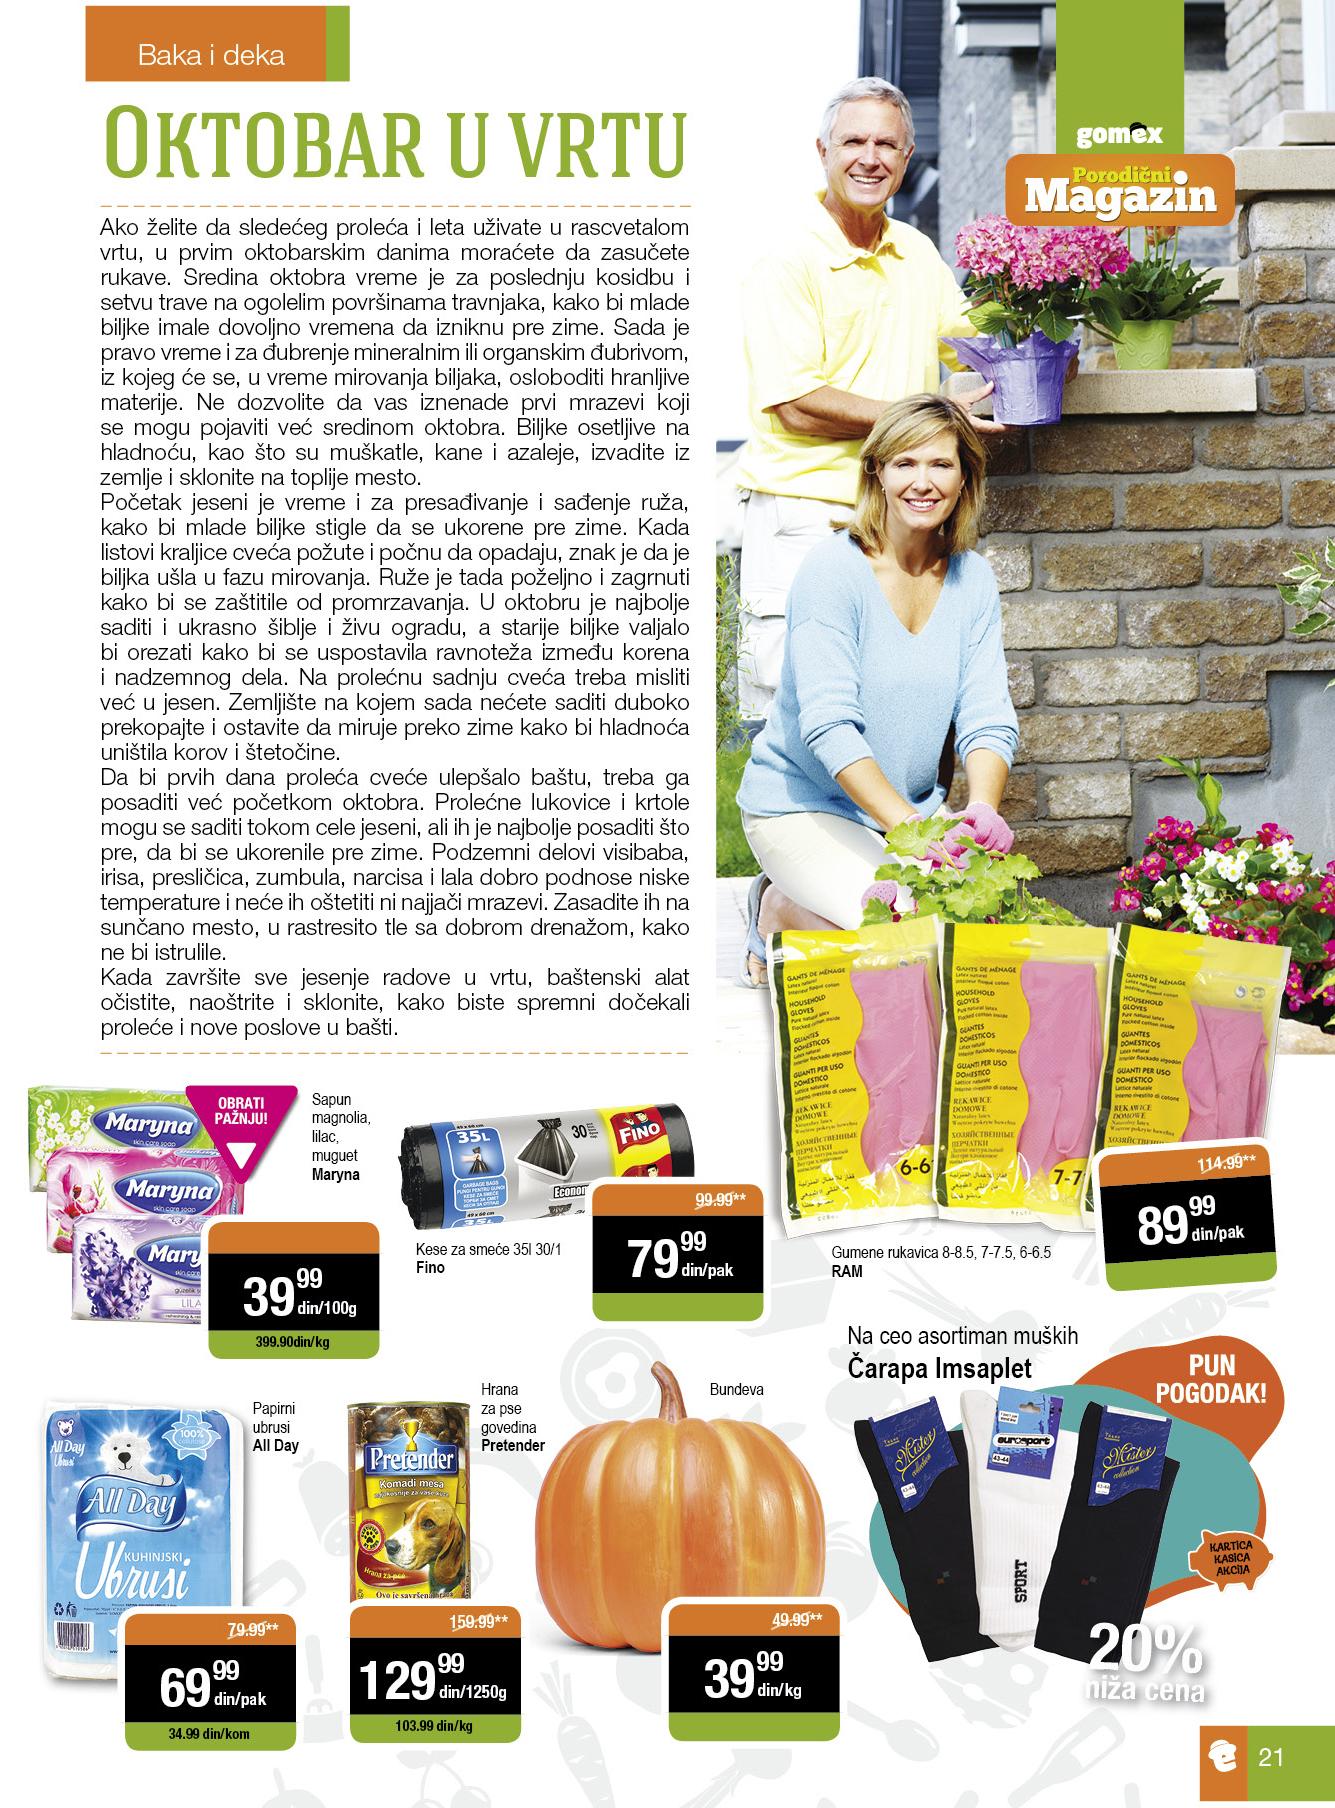 Gomex akcija oktobarske ponude